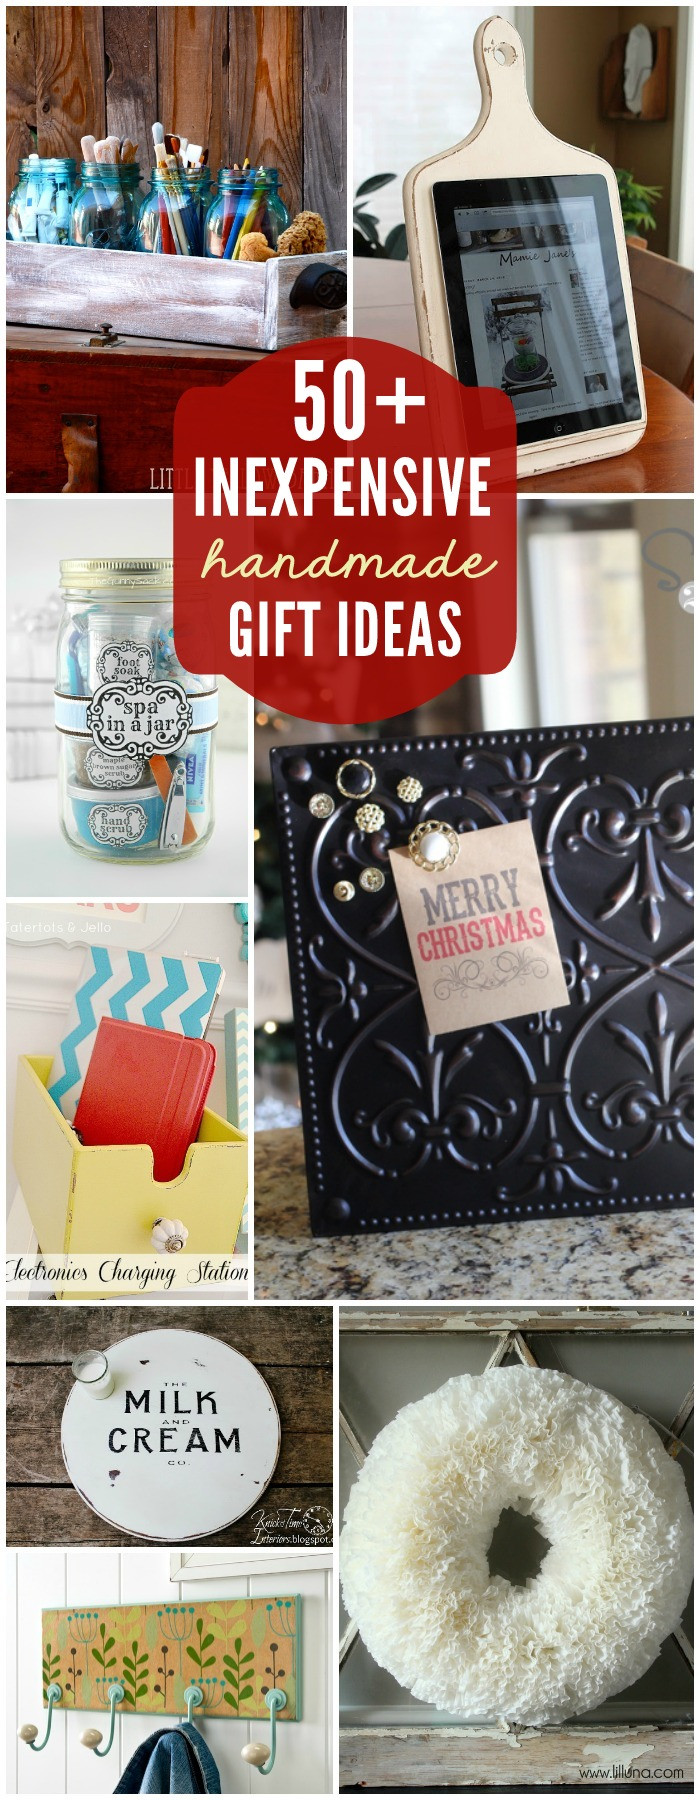 Diy Holiday Gift Ideas  75 Gift Ideas under $5